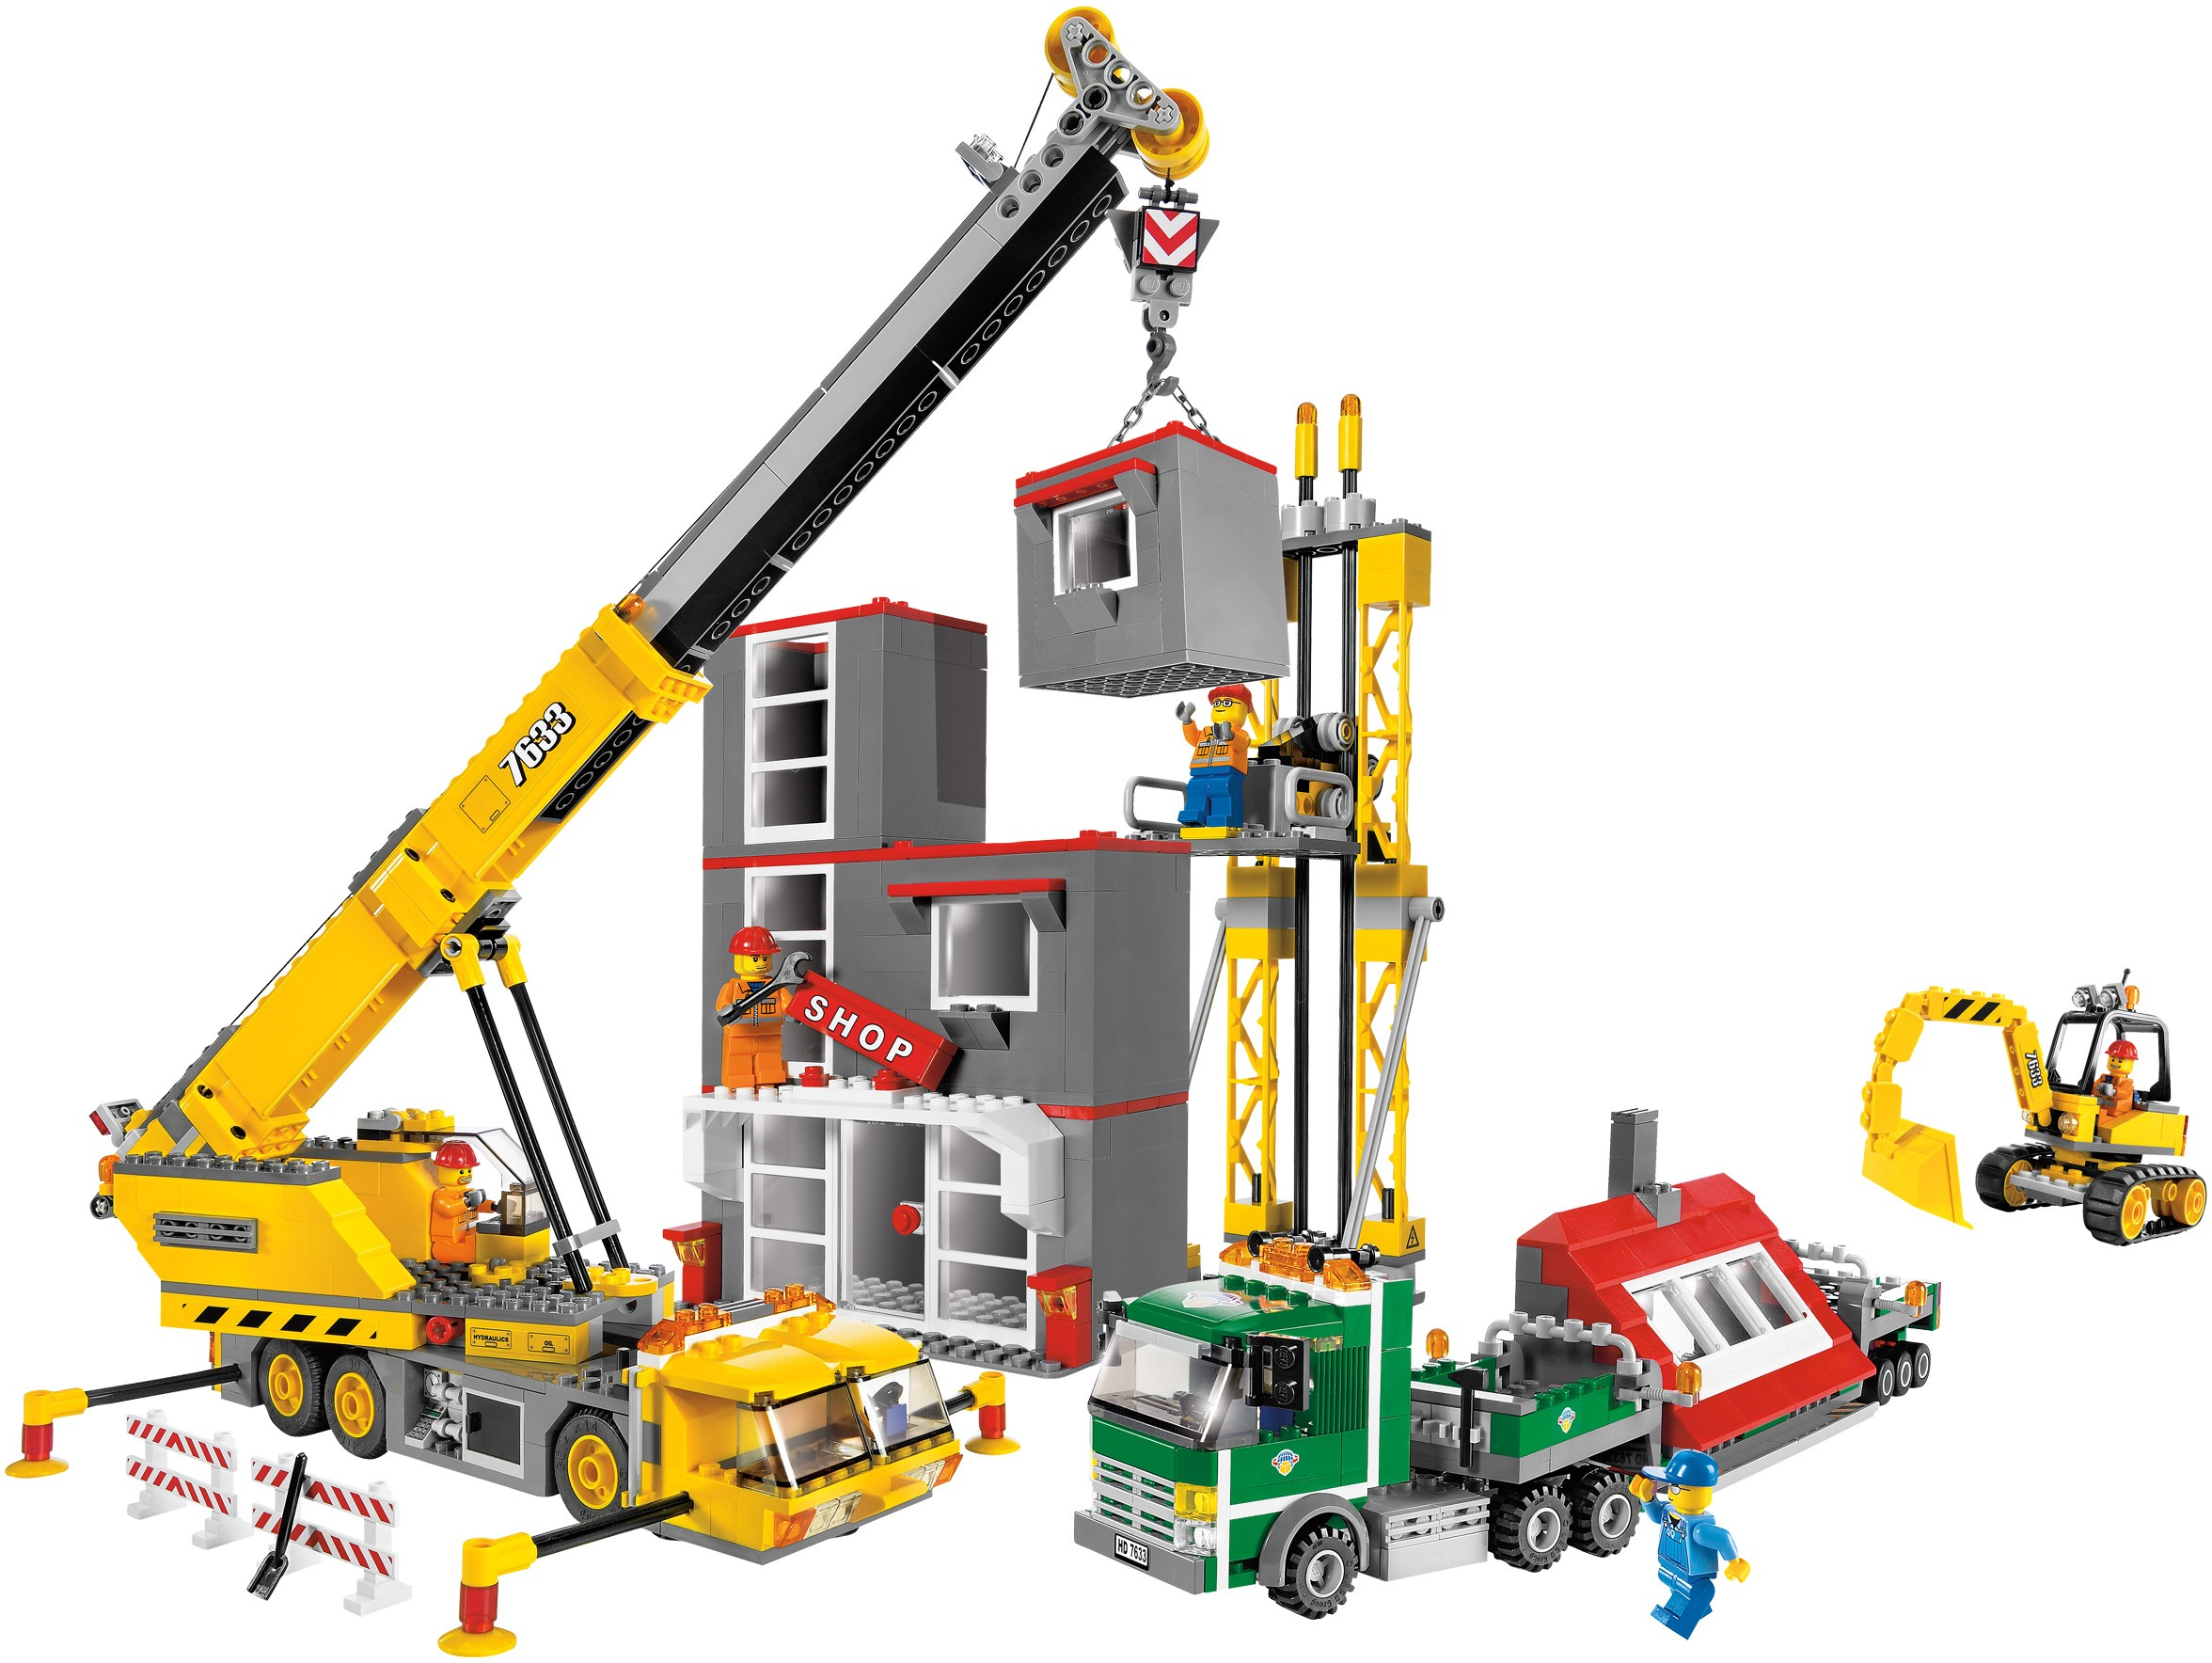 City construction brickset lego set guide and database for Construction